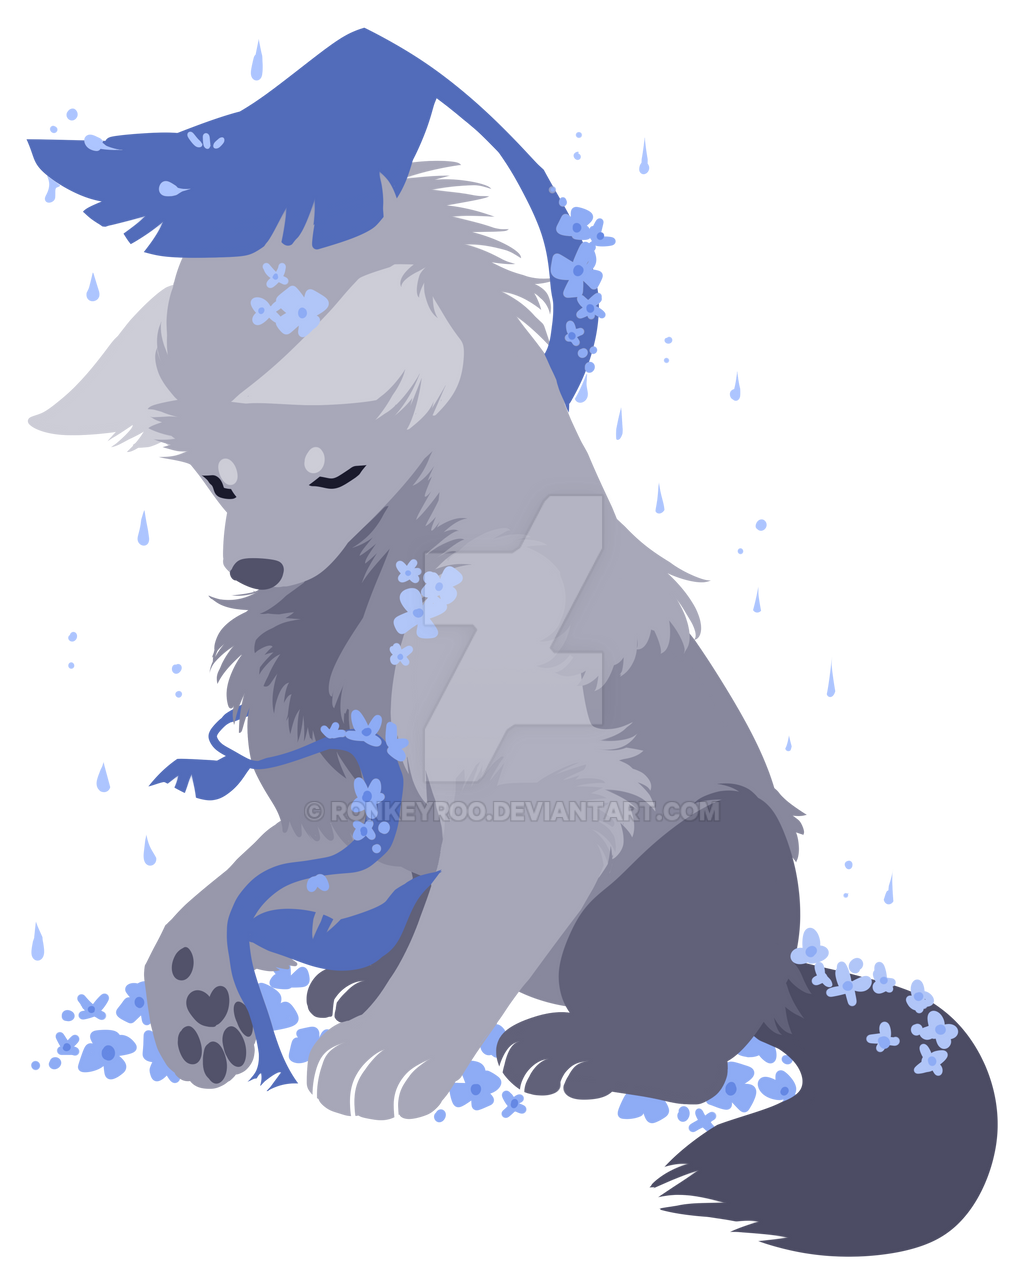 + Rainy Wolf + by Ronkeyroo